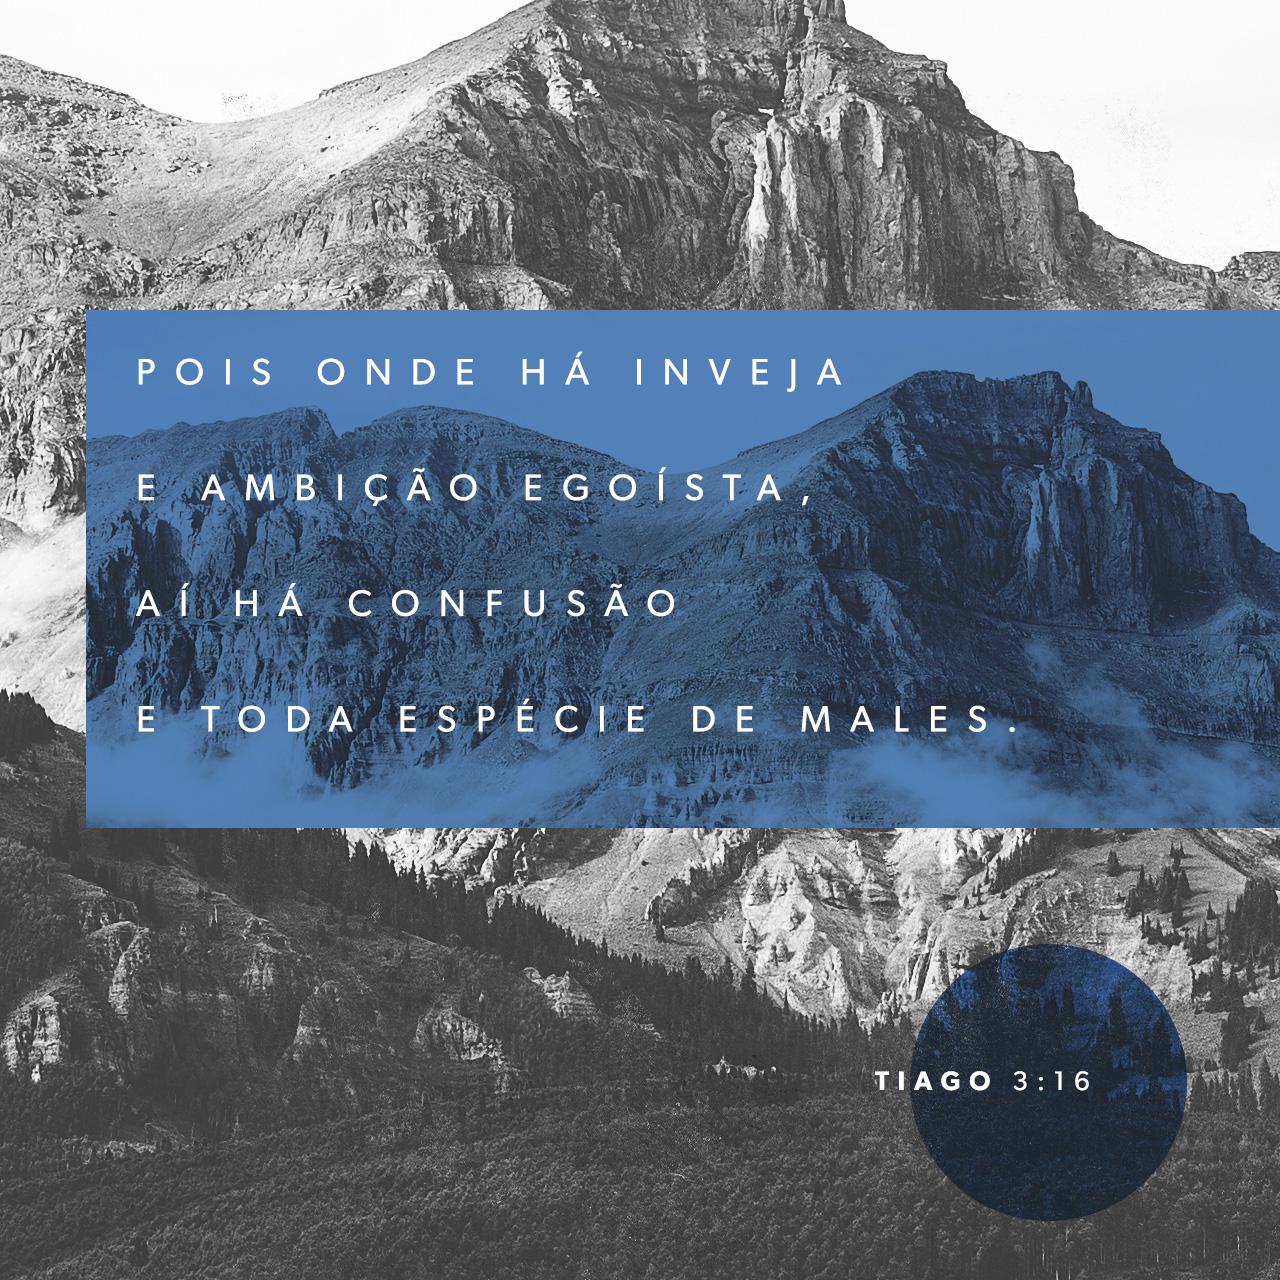 James 3:16 (JPG)